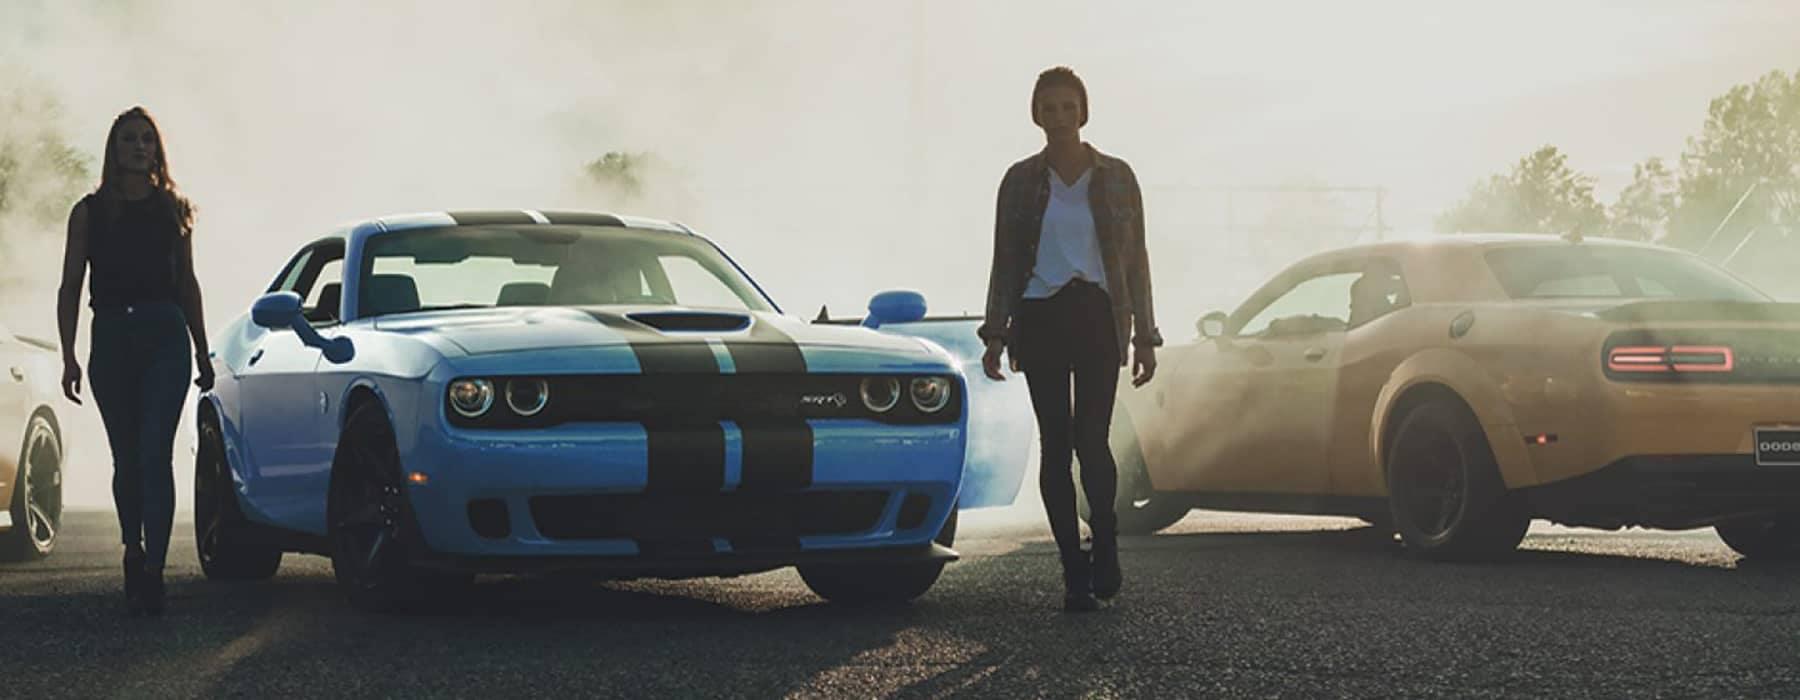 2018 Dodge Challenger Pair